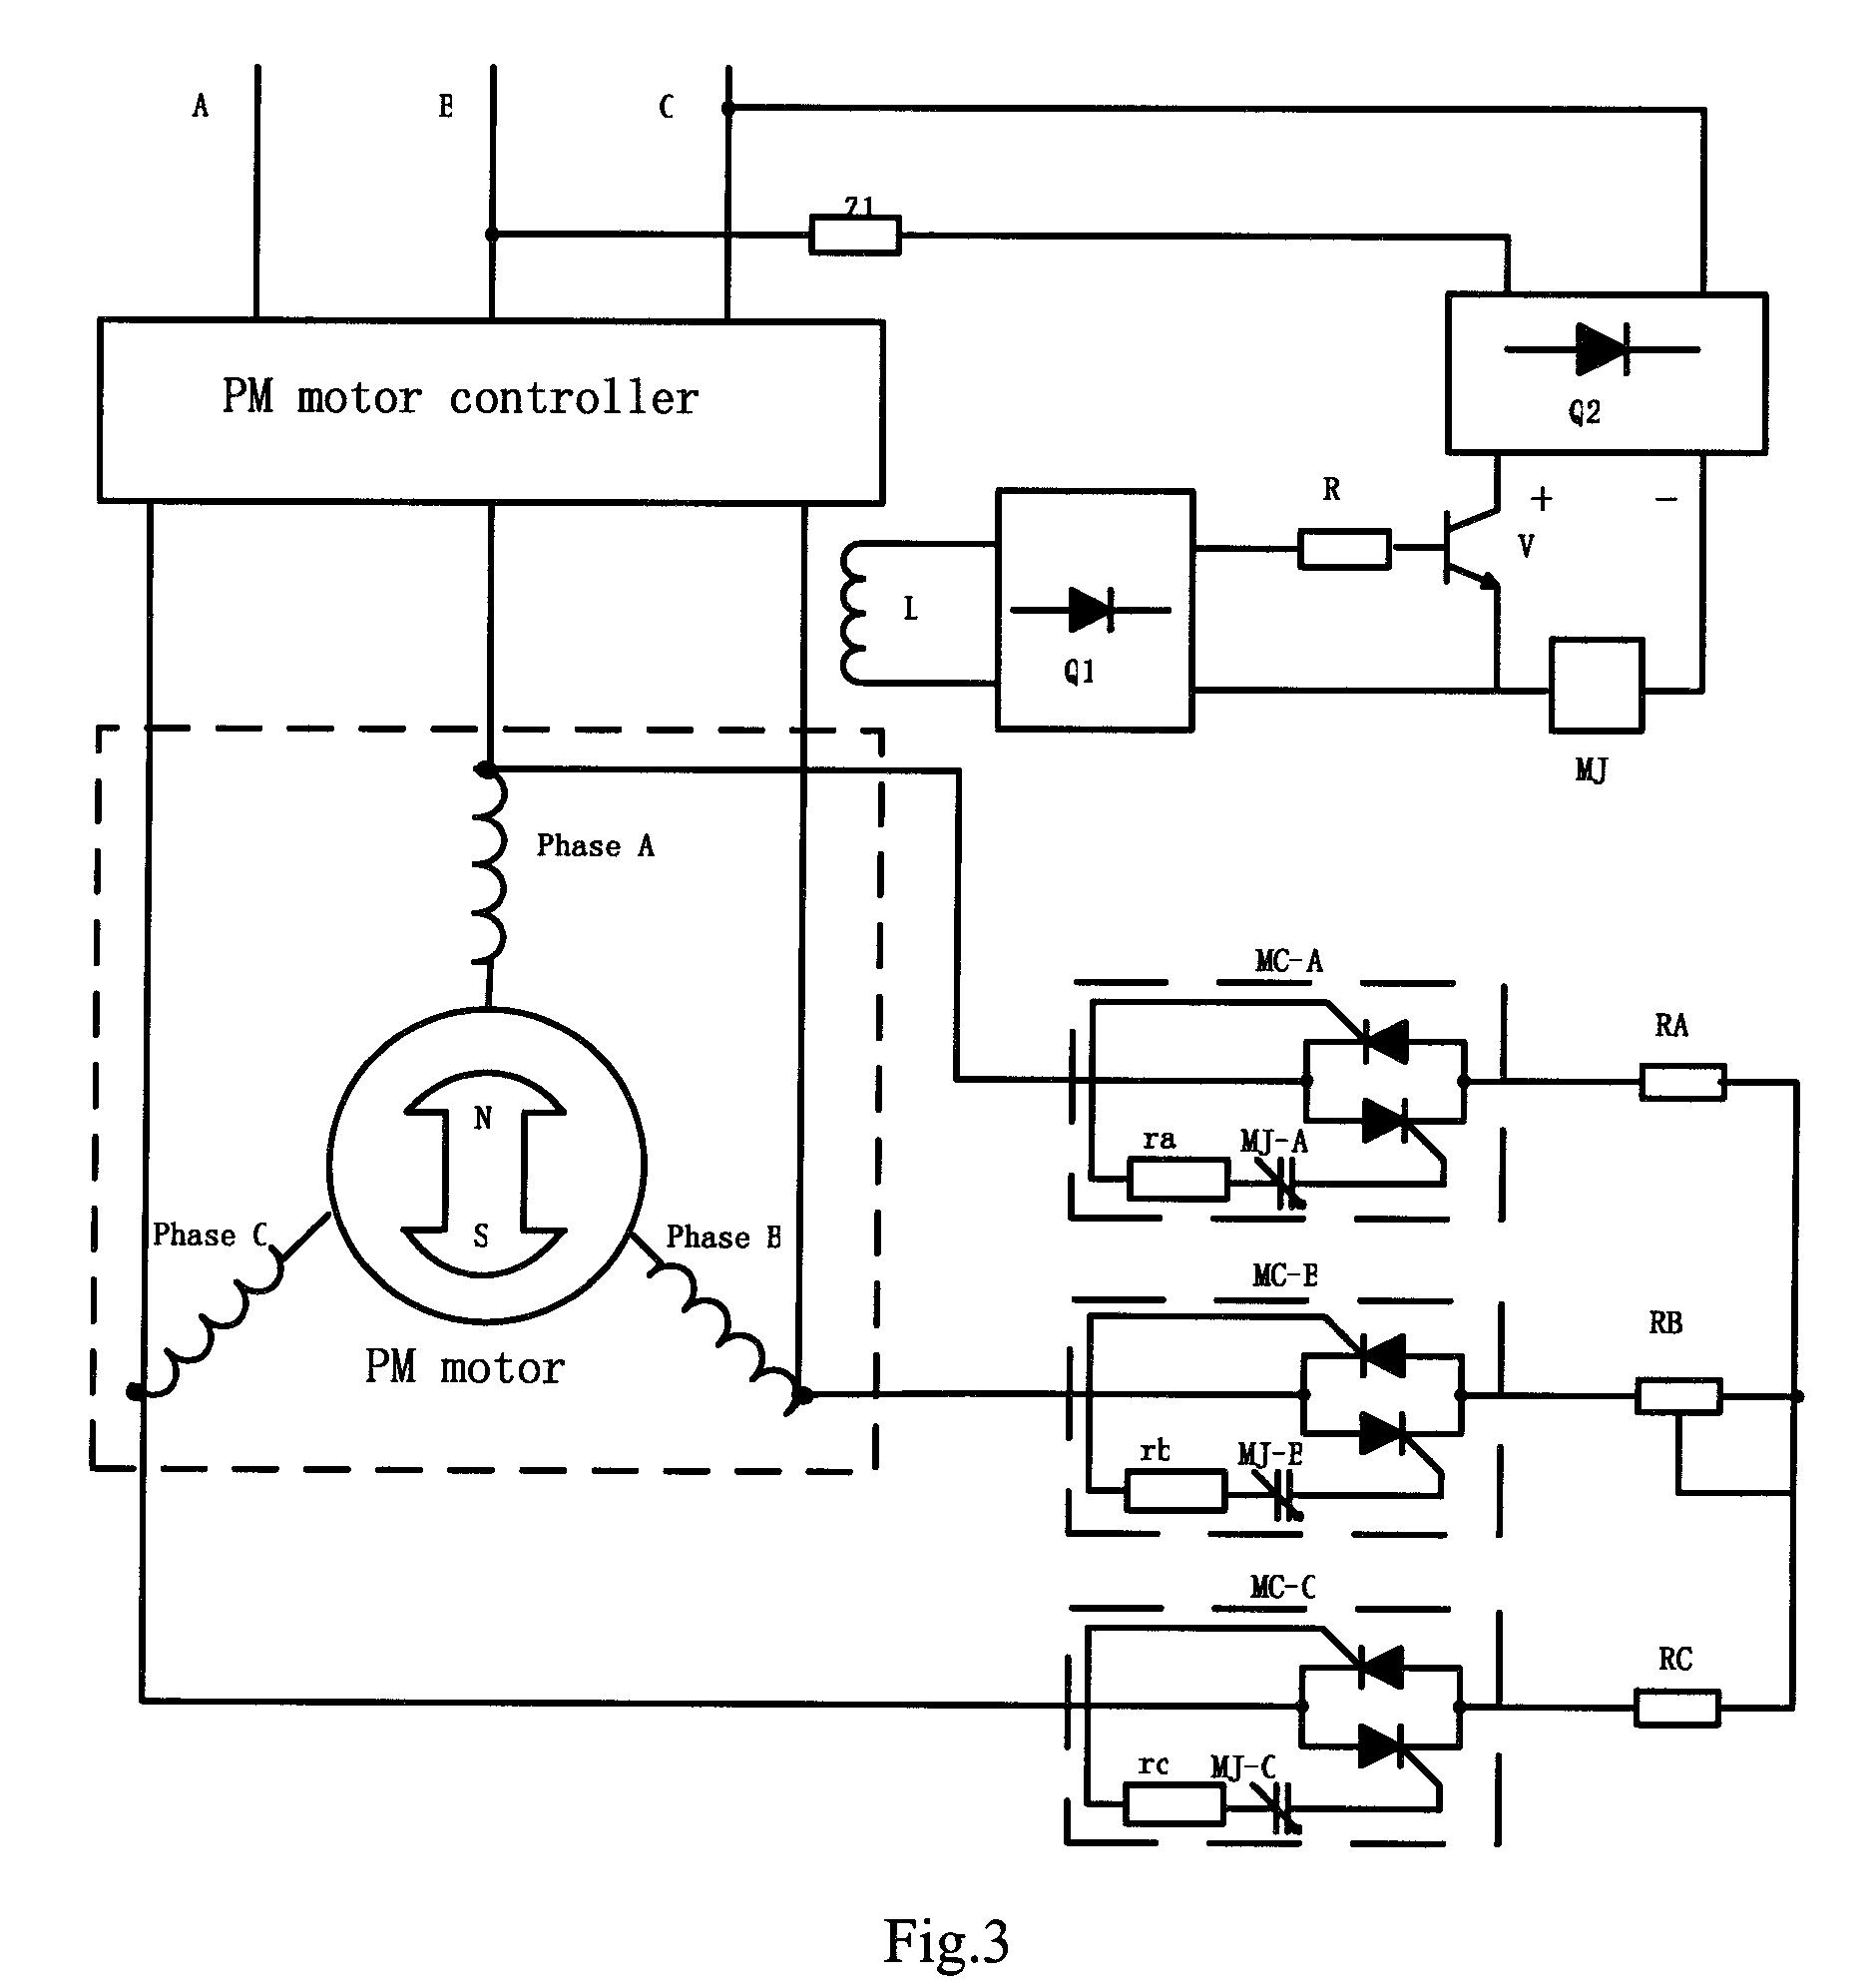 regenerative braking of bldc motor